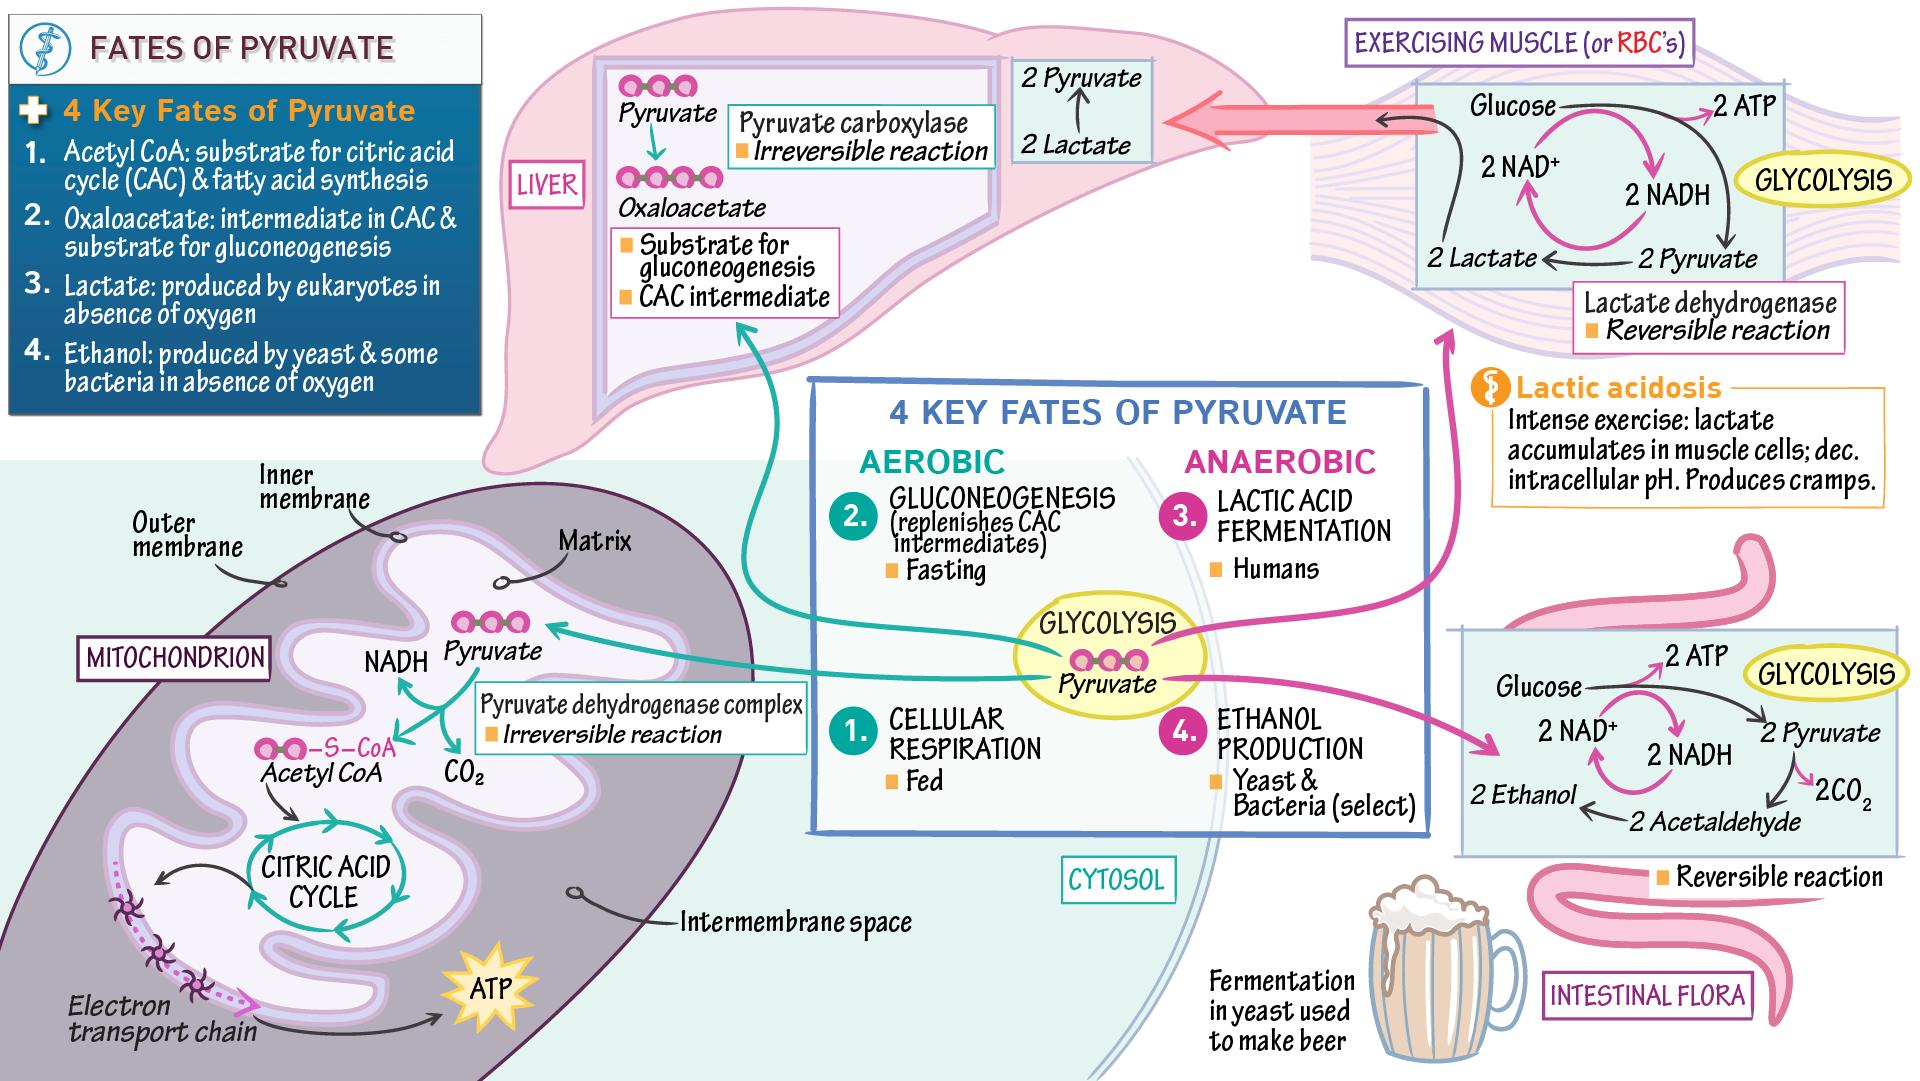 Biochemistry Fates Of Pyruvate